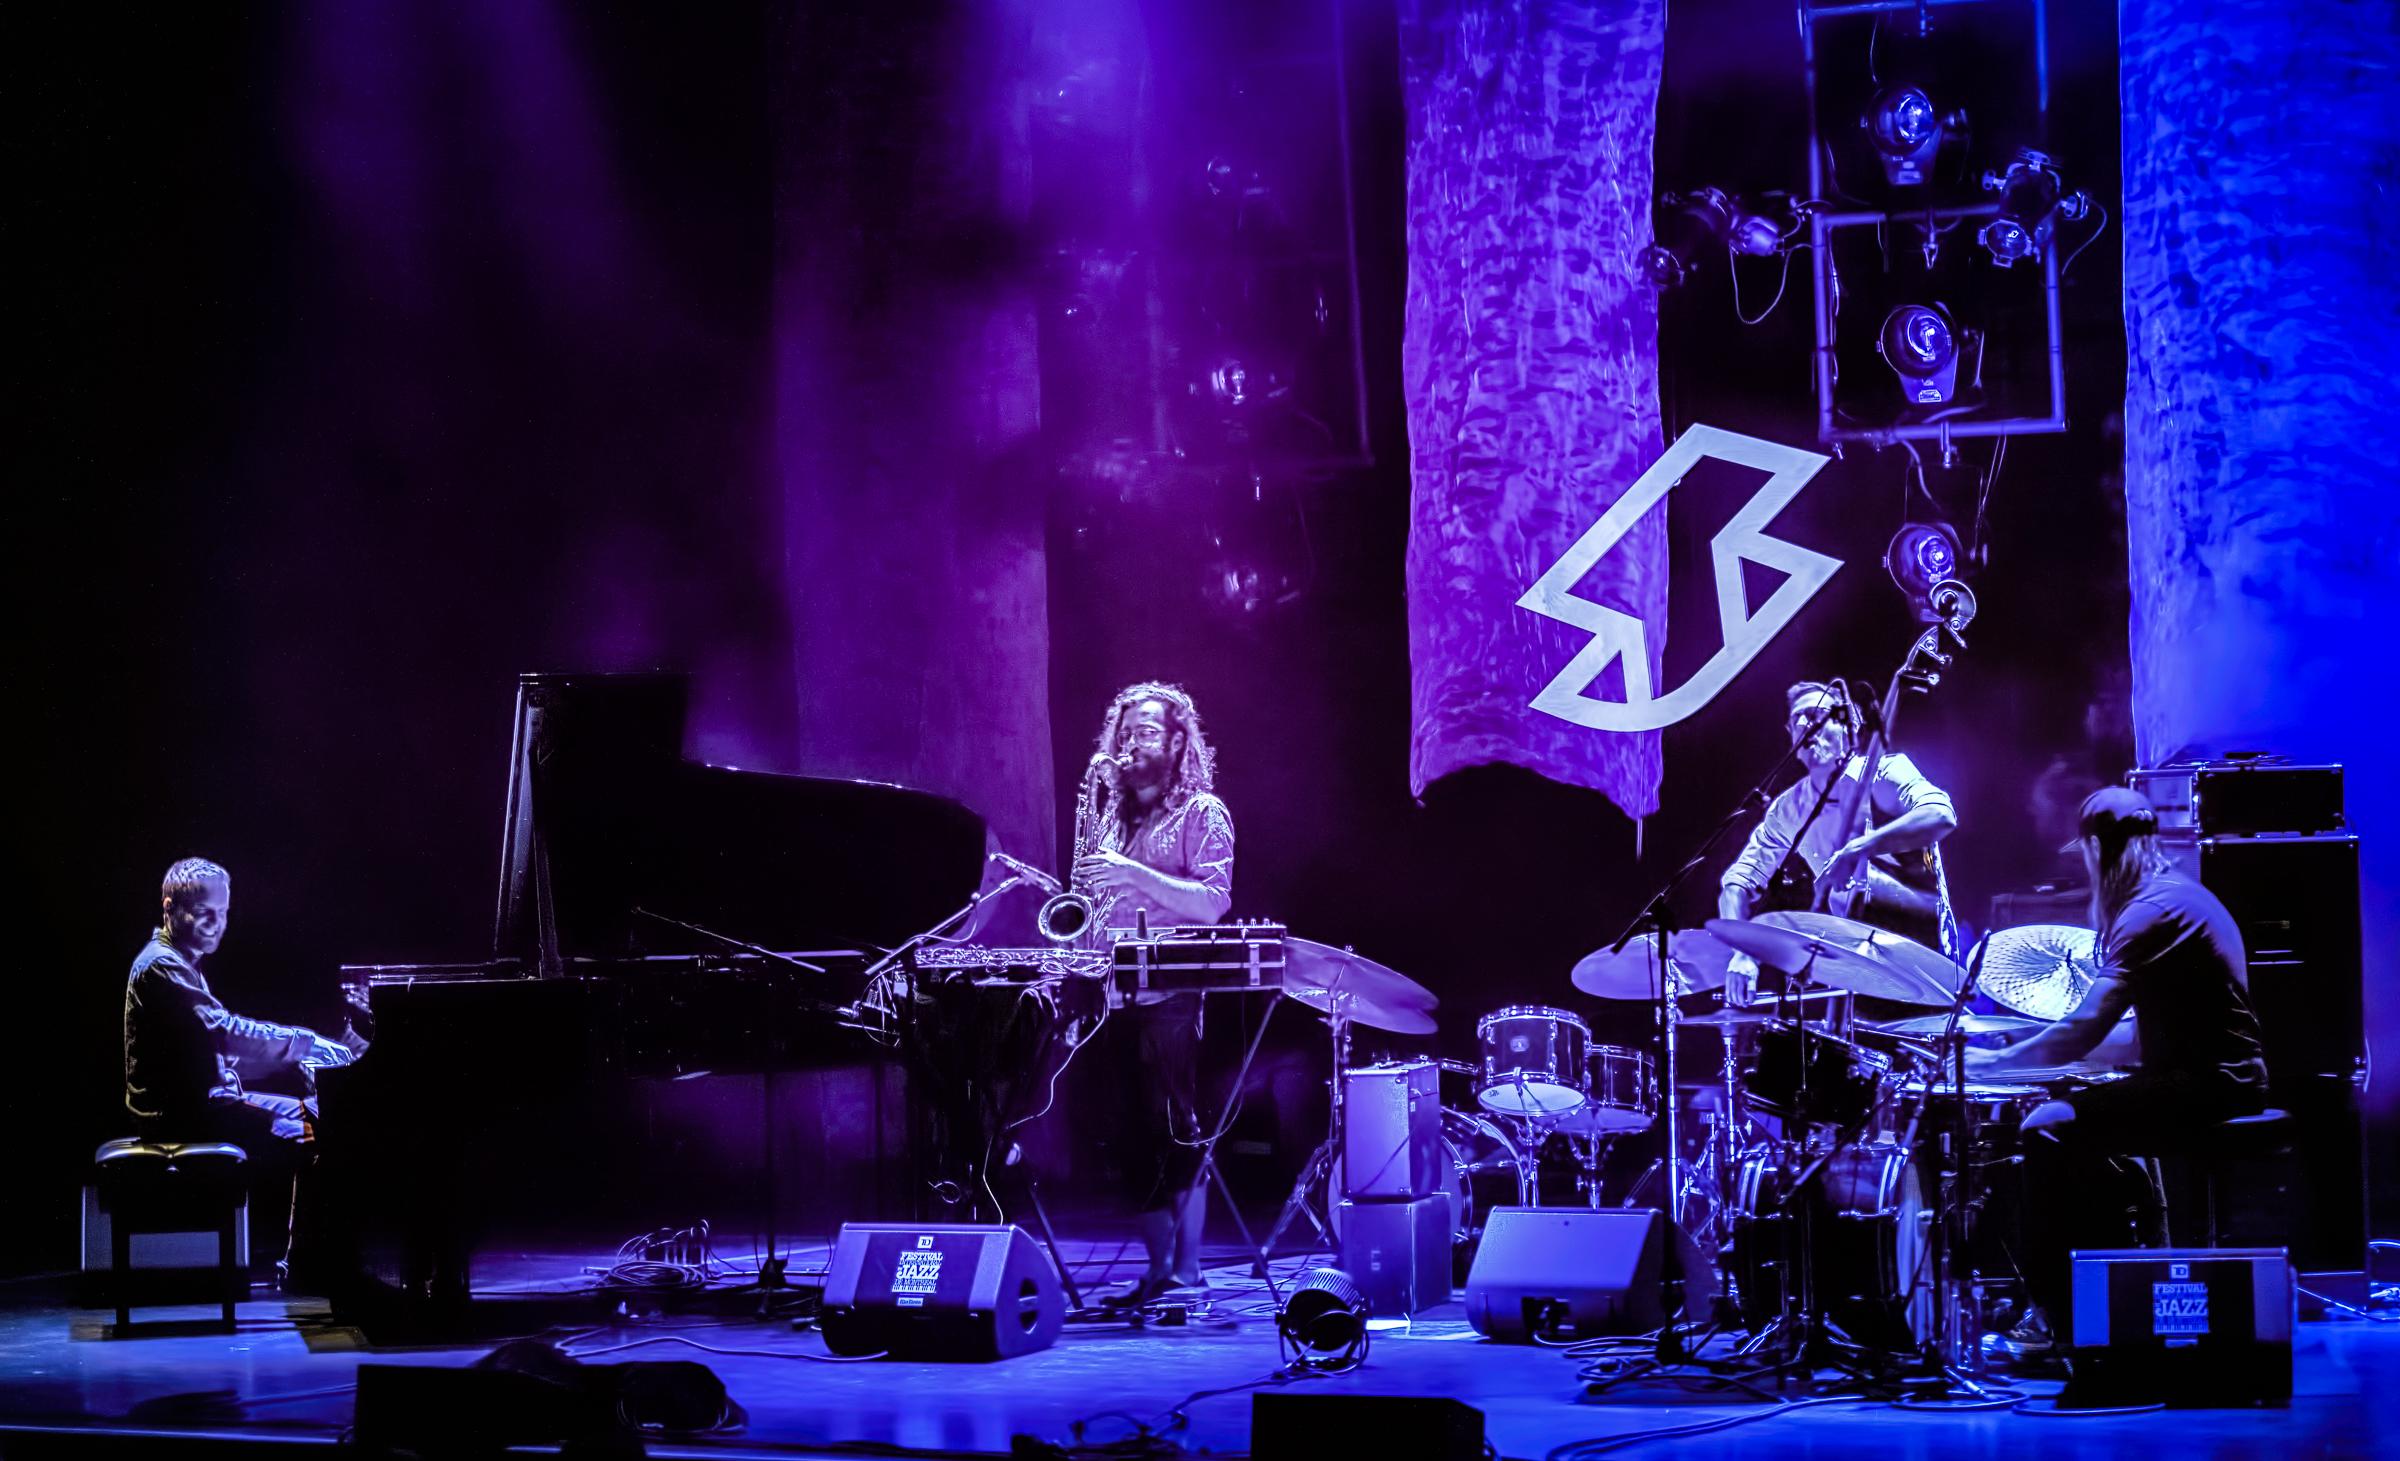 Arnaud Spick Saucier, Alex Dodier, Etienne Dextraze and Philippe Lussier Baillargeon with SHPIK at The Montreal International Jazz Festival 2018